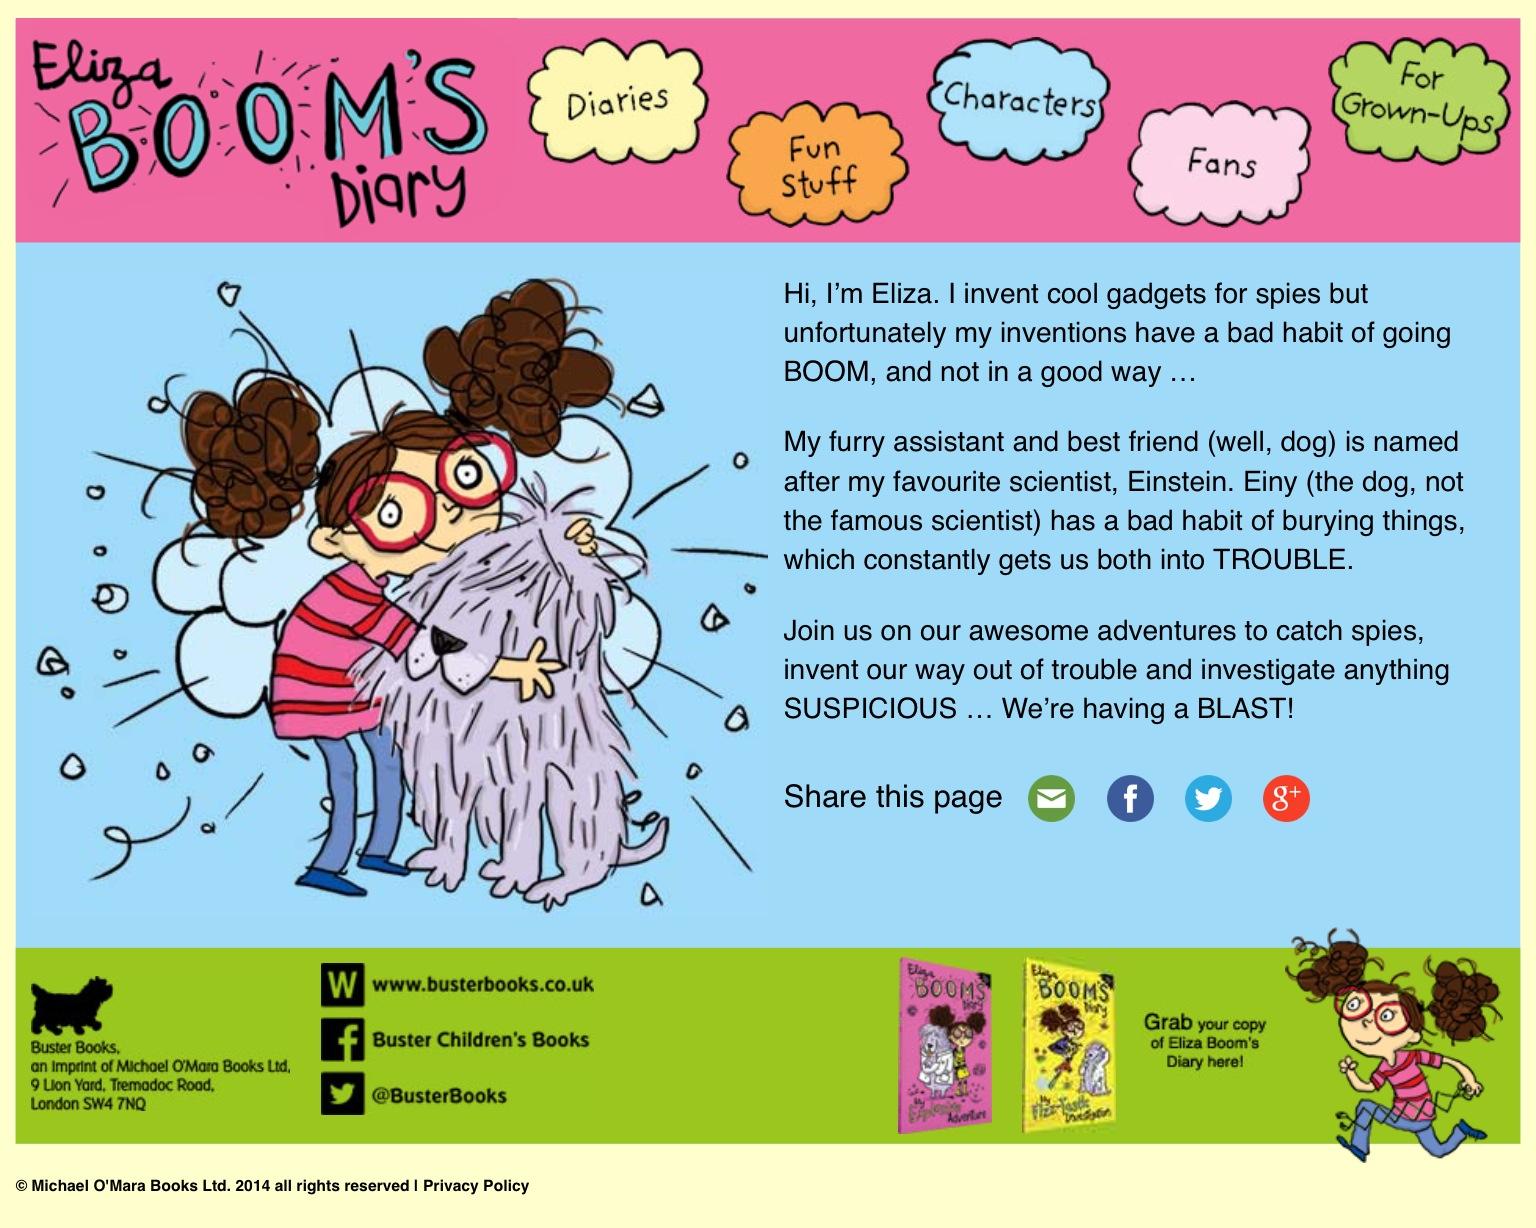 Eliza Boom publishing mini-site for Buster Books